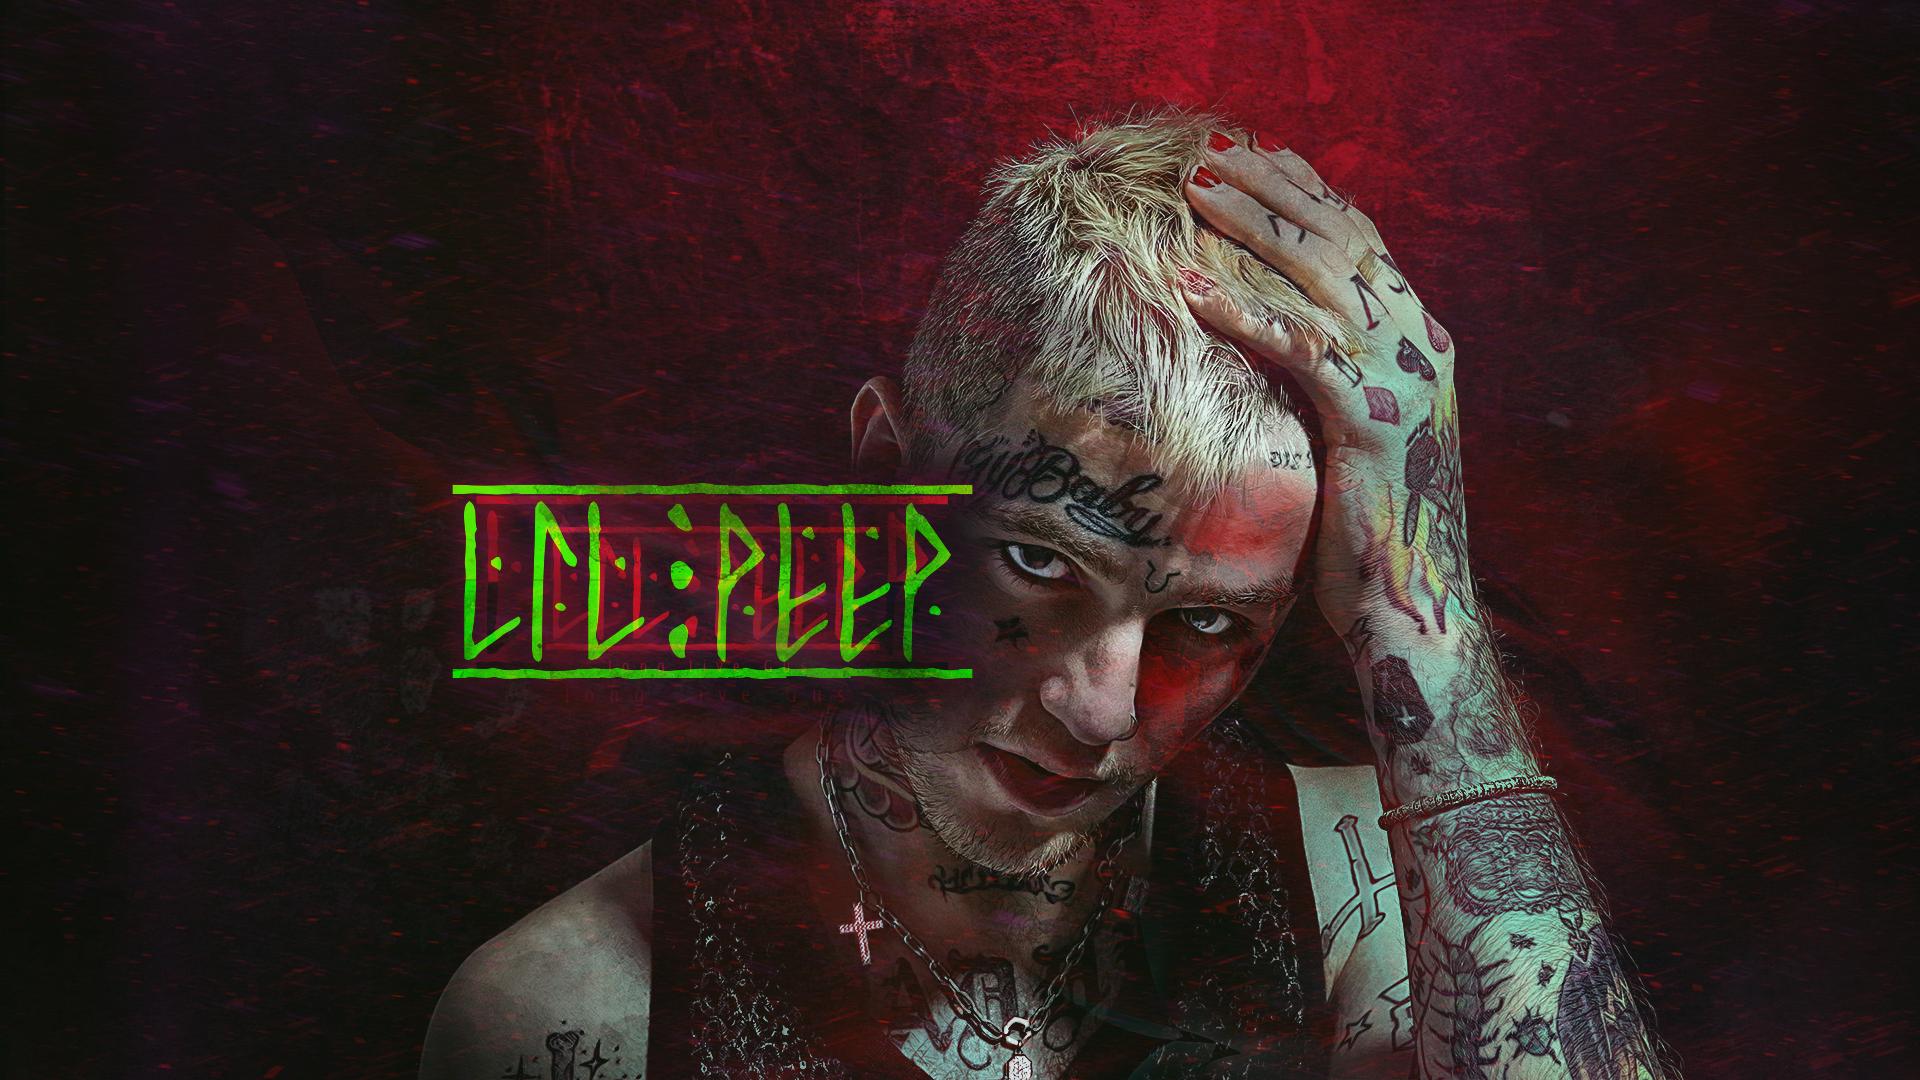 In Loving Memory Of Lil Peep 1920x1080 By Intern9ne On Deviantart